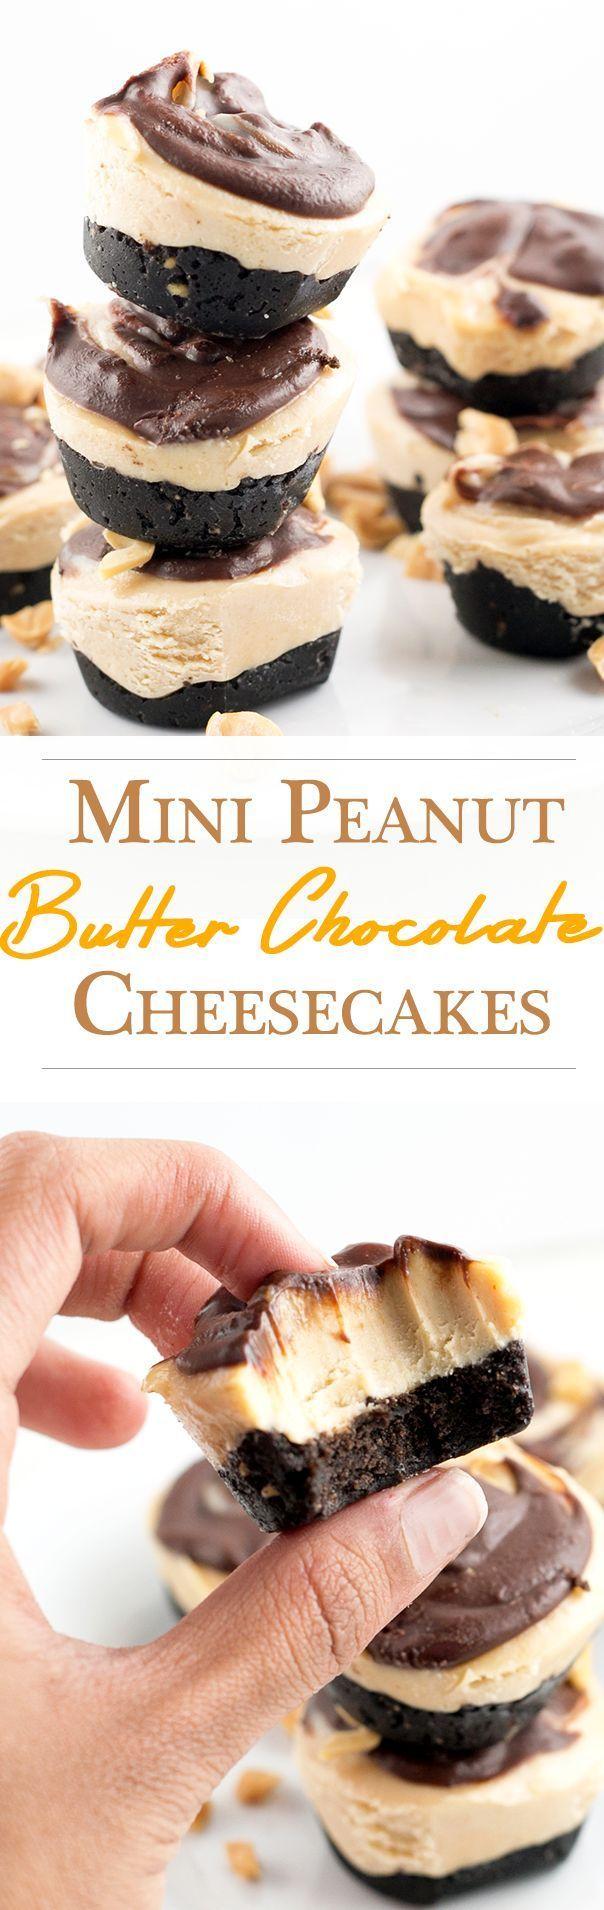 Mini Peanut Butter Cheesecakes With Chocolate Ganache Swirl. VEGAN, Simple, Delicious.